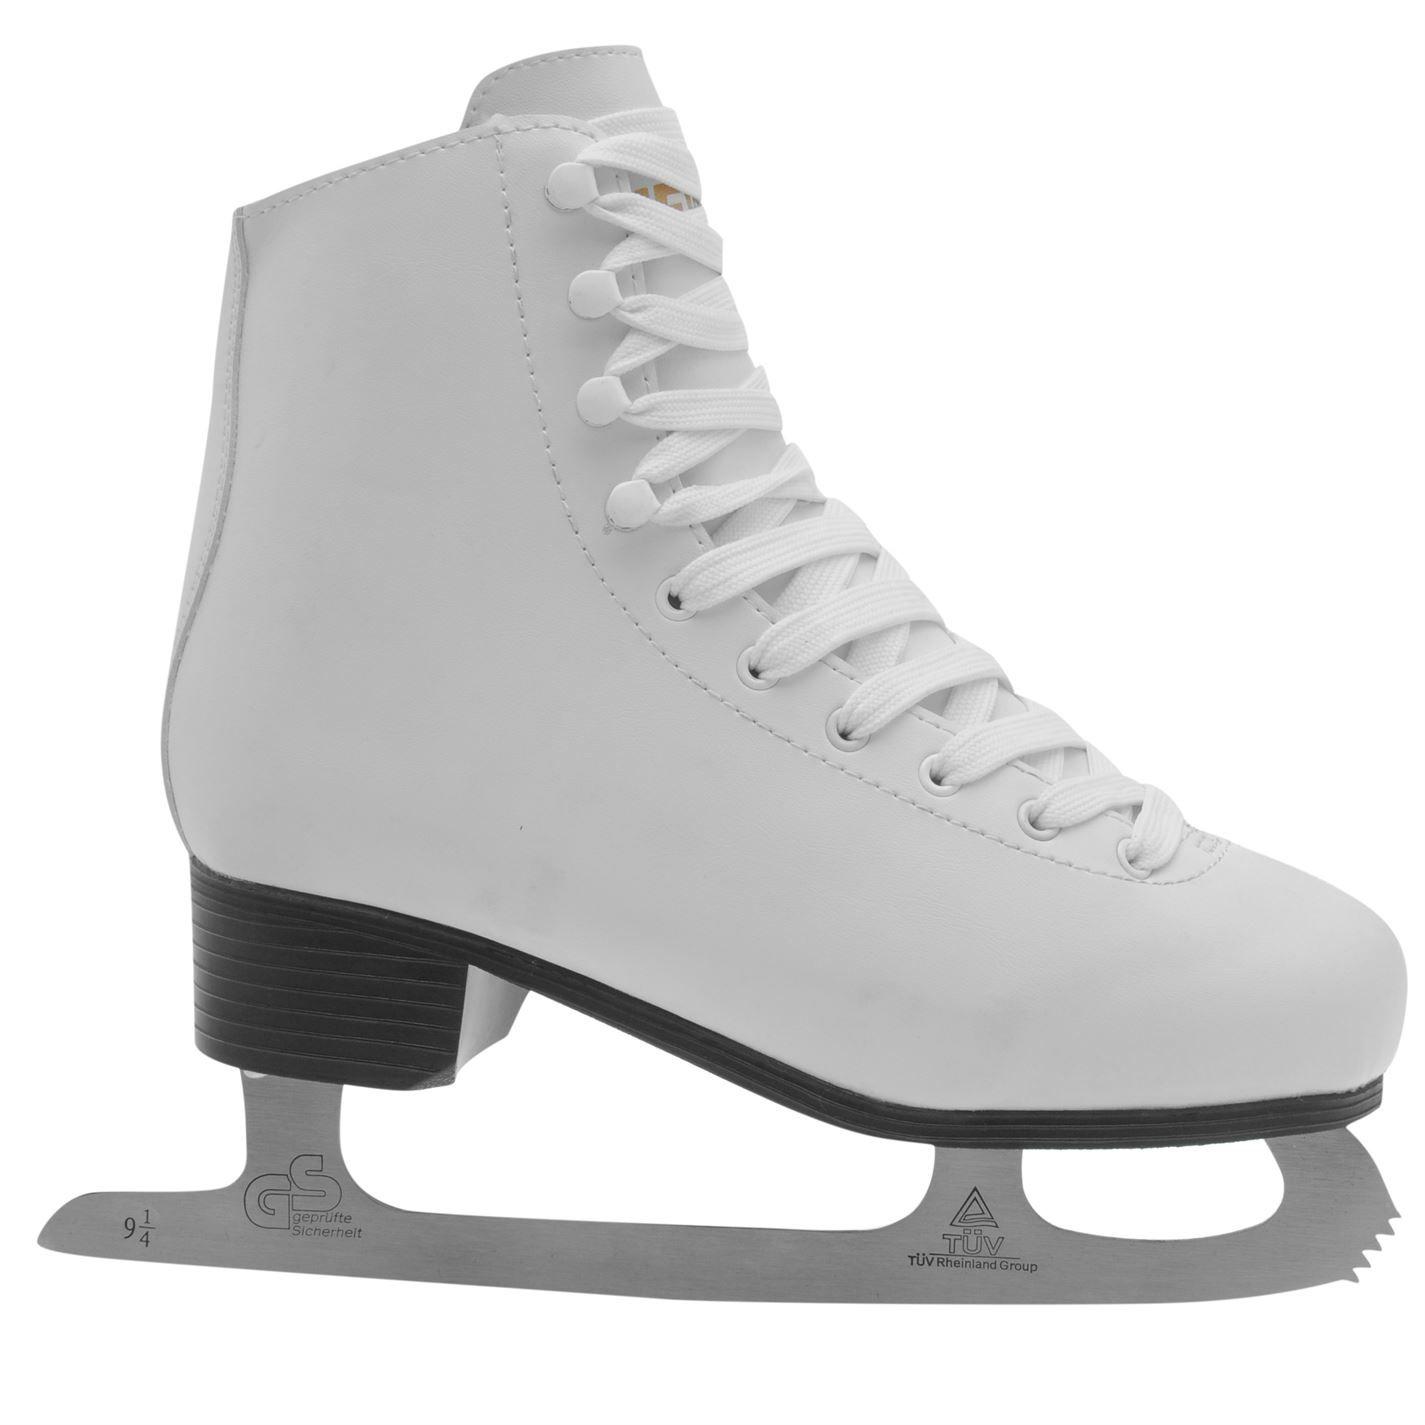 Figure Ladies Ice Skate Womens Figure Skates Shoe Boots Classic Lace